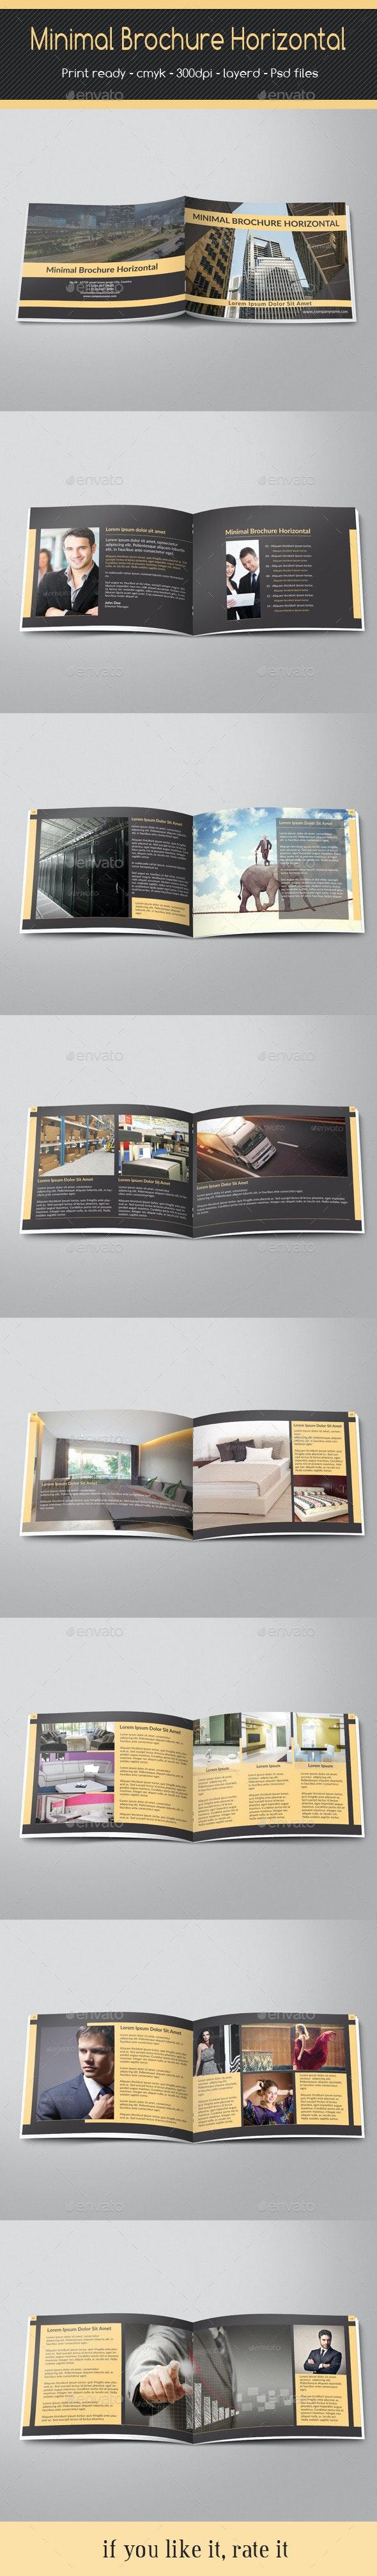 Minimal Brochure Horizontal - Portfolio Brochures